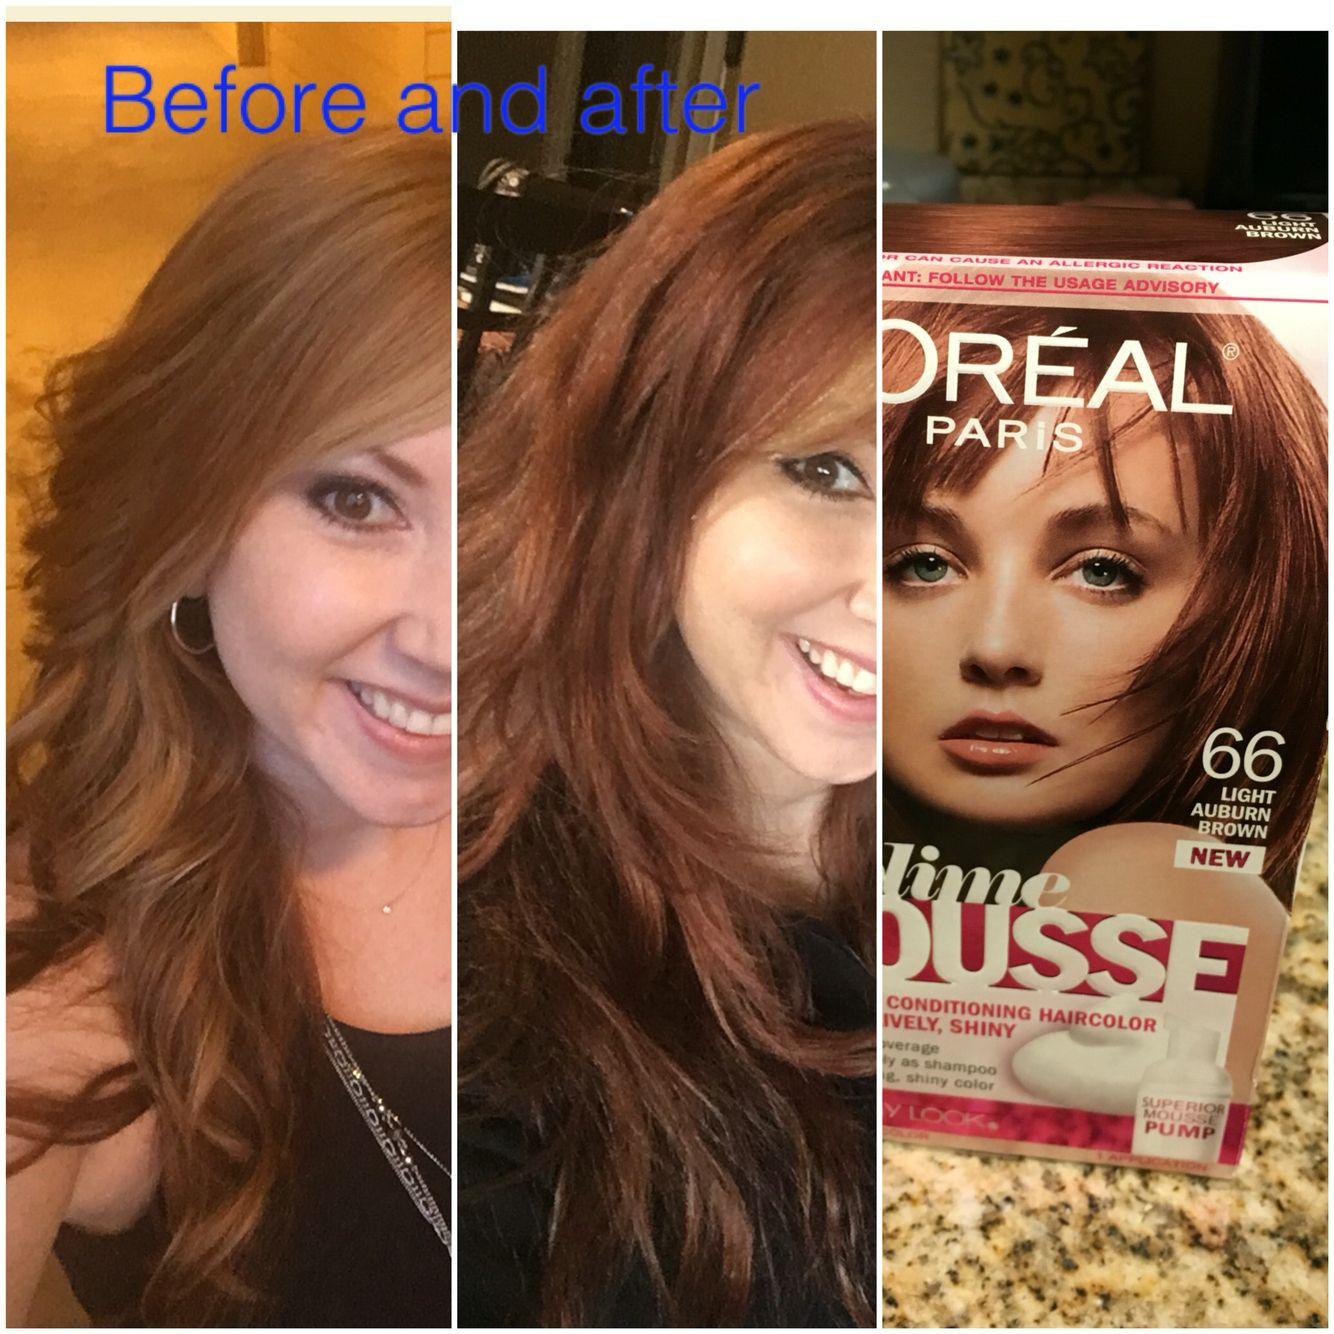 My New Favorite Red Auburn Brown Hair Color Loreal Sublime Mousse Diy Redhair Loveredhair 2016 Redbrownhair Boxdye 66 Light